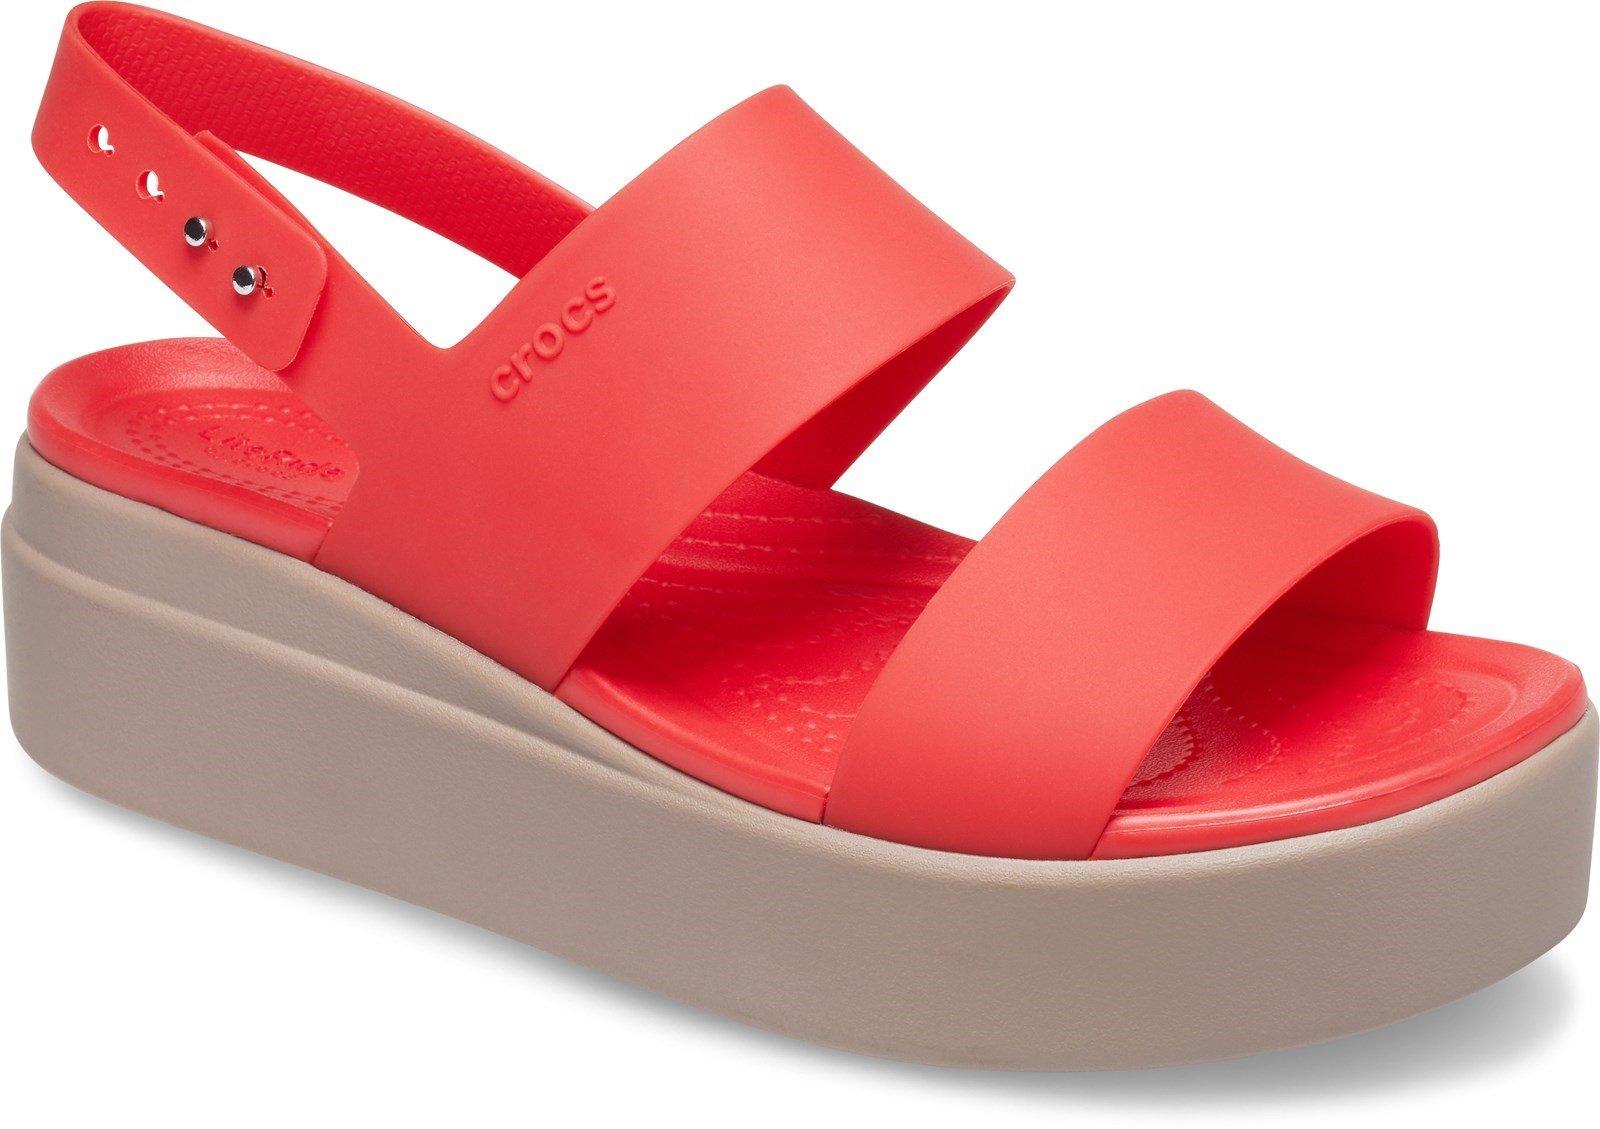 Crocs Women's Brooklyn Low Wedge Platform Sandal Various Colours 31458 - Flame/Mushroom 3